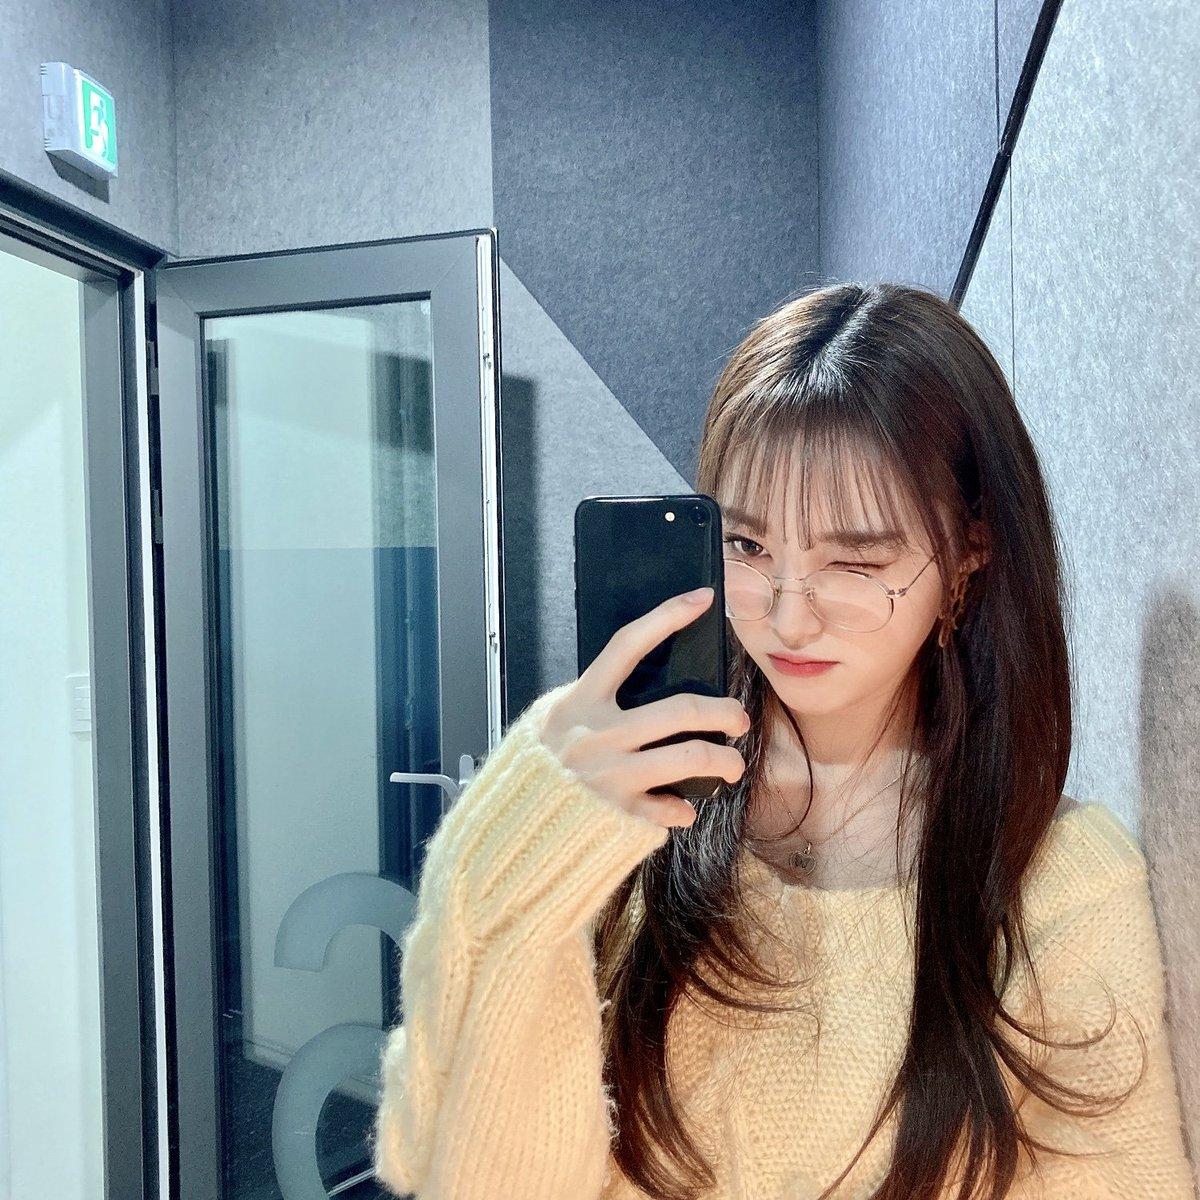 [#Zoa #조아]  good morning~! ❄